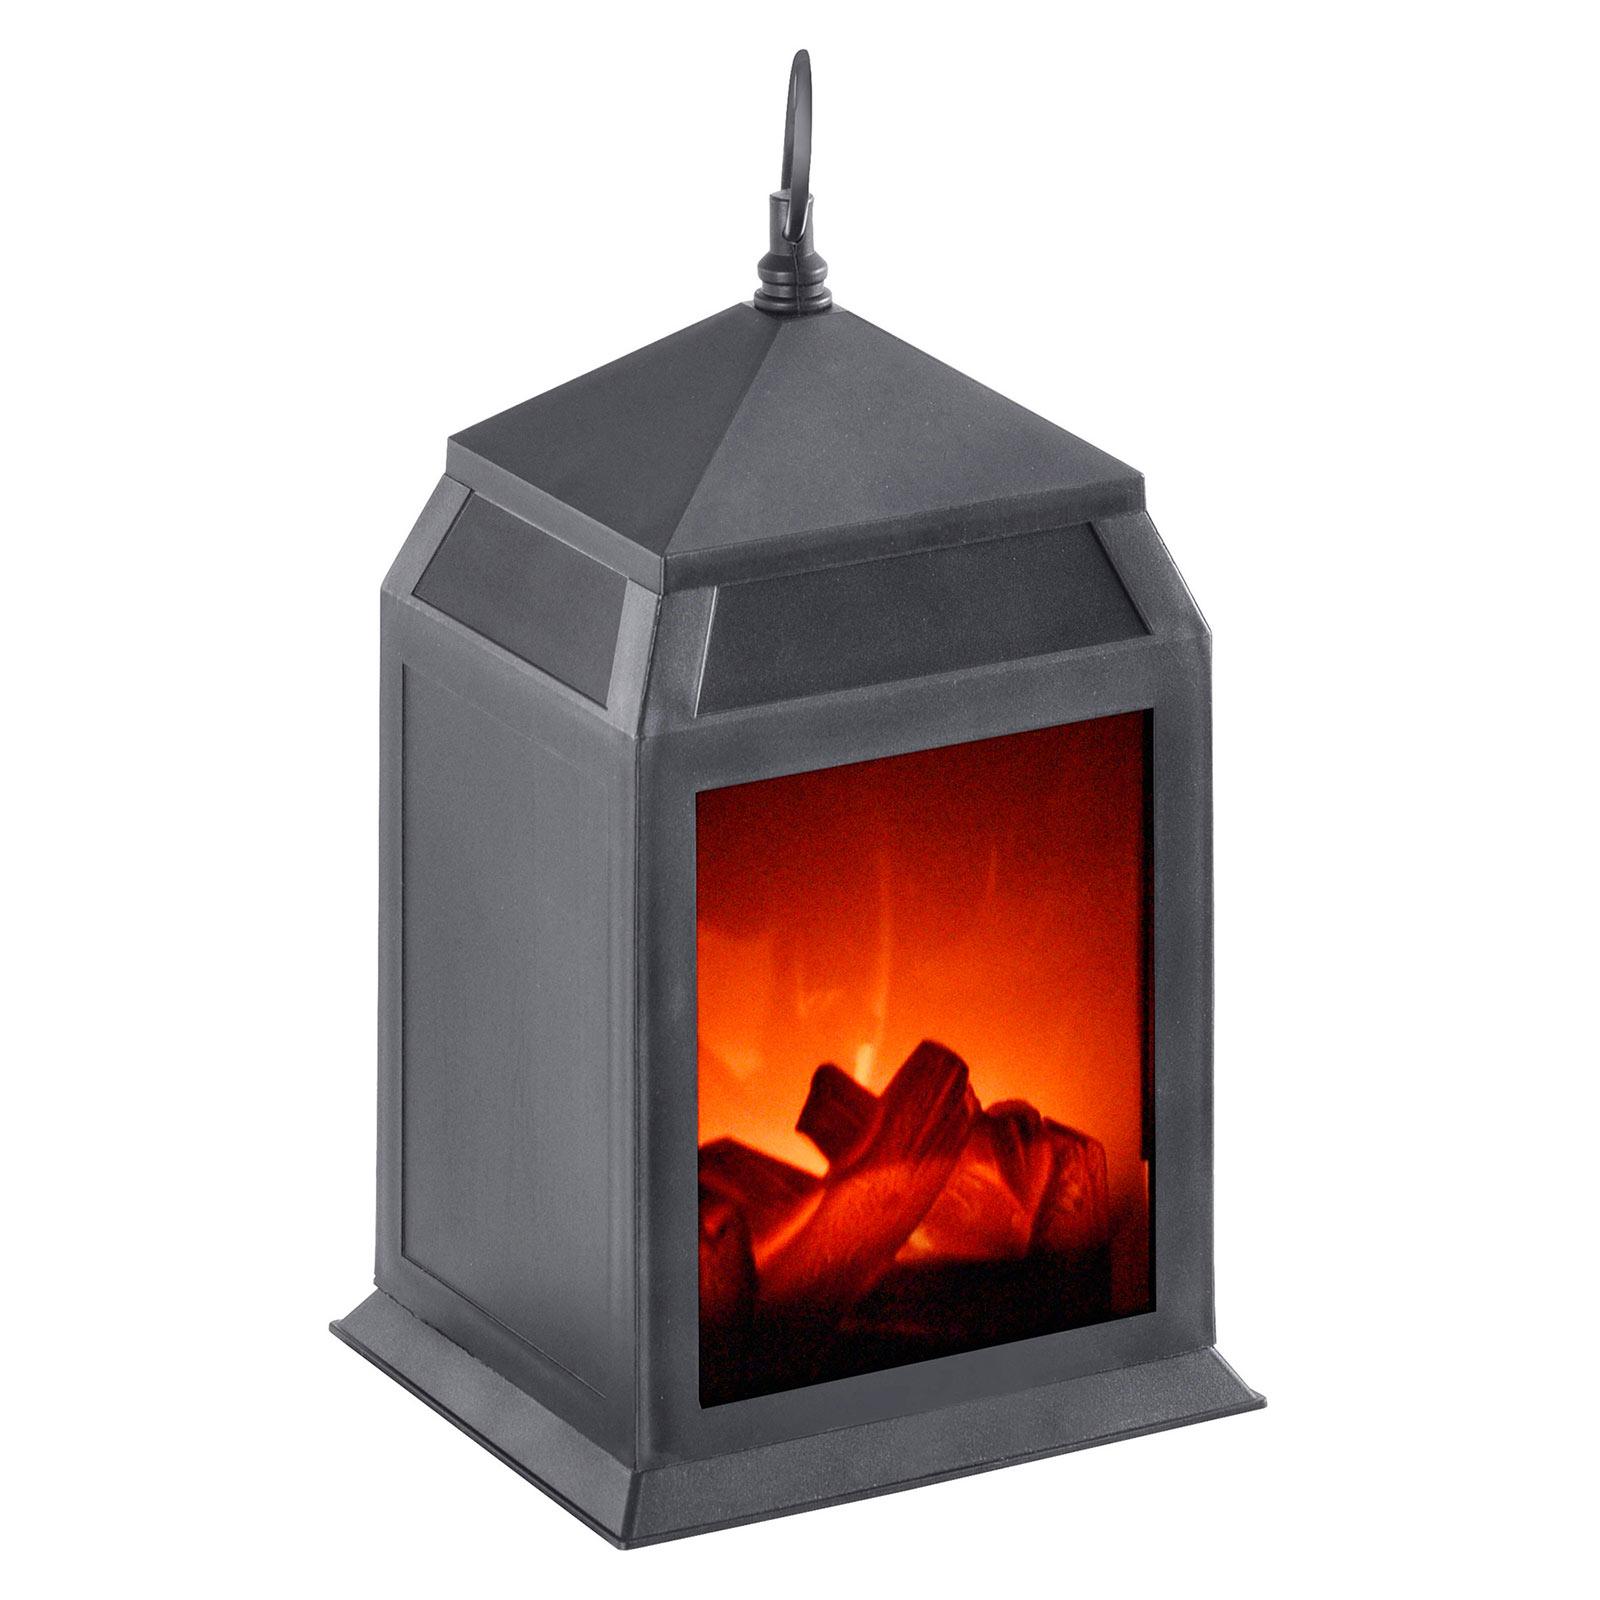 LED-Dekoleuchte Chimney, tragbar, Breite 15,8 cm